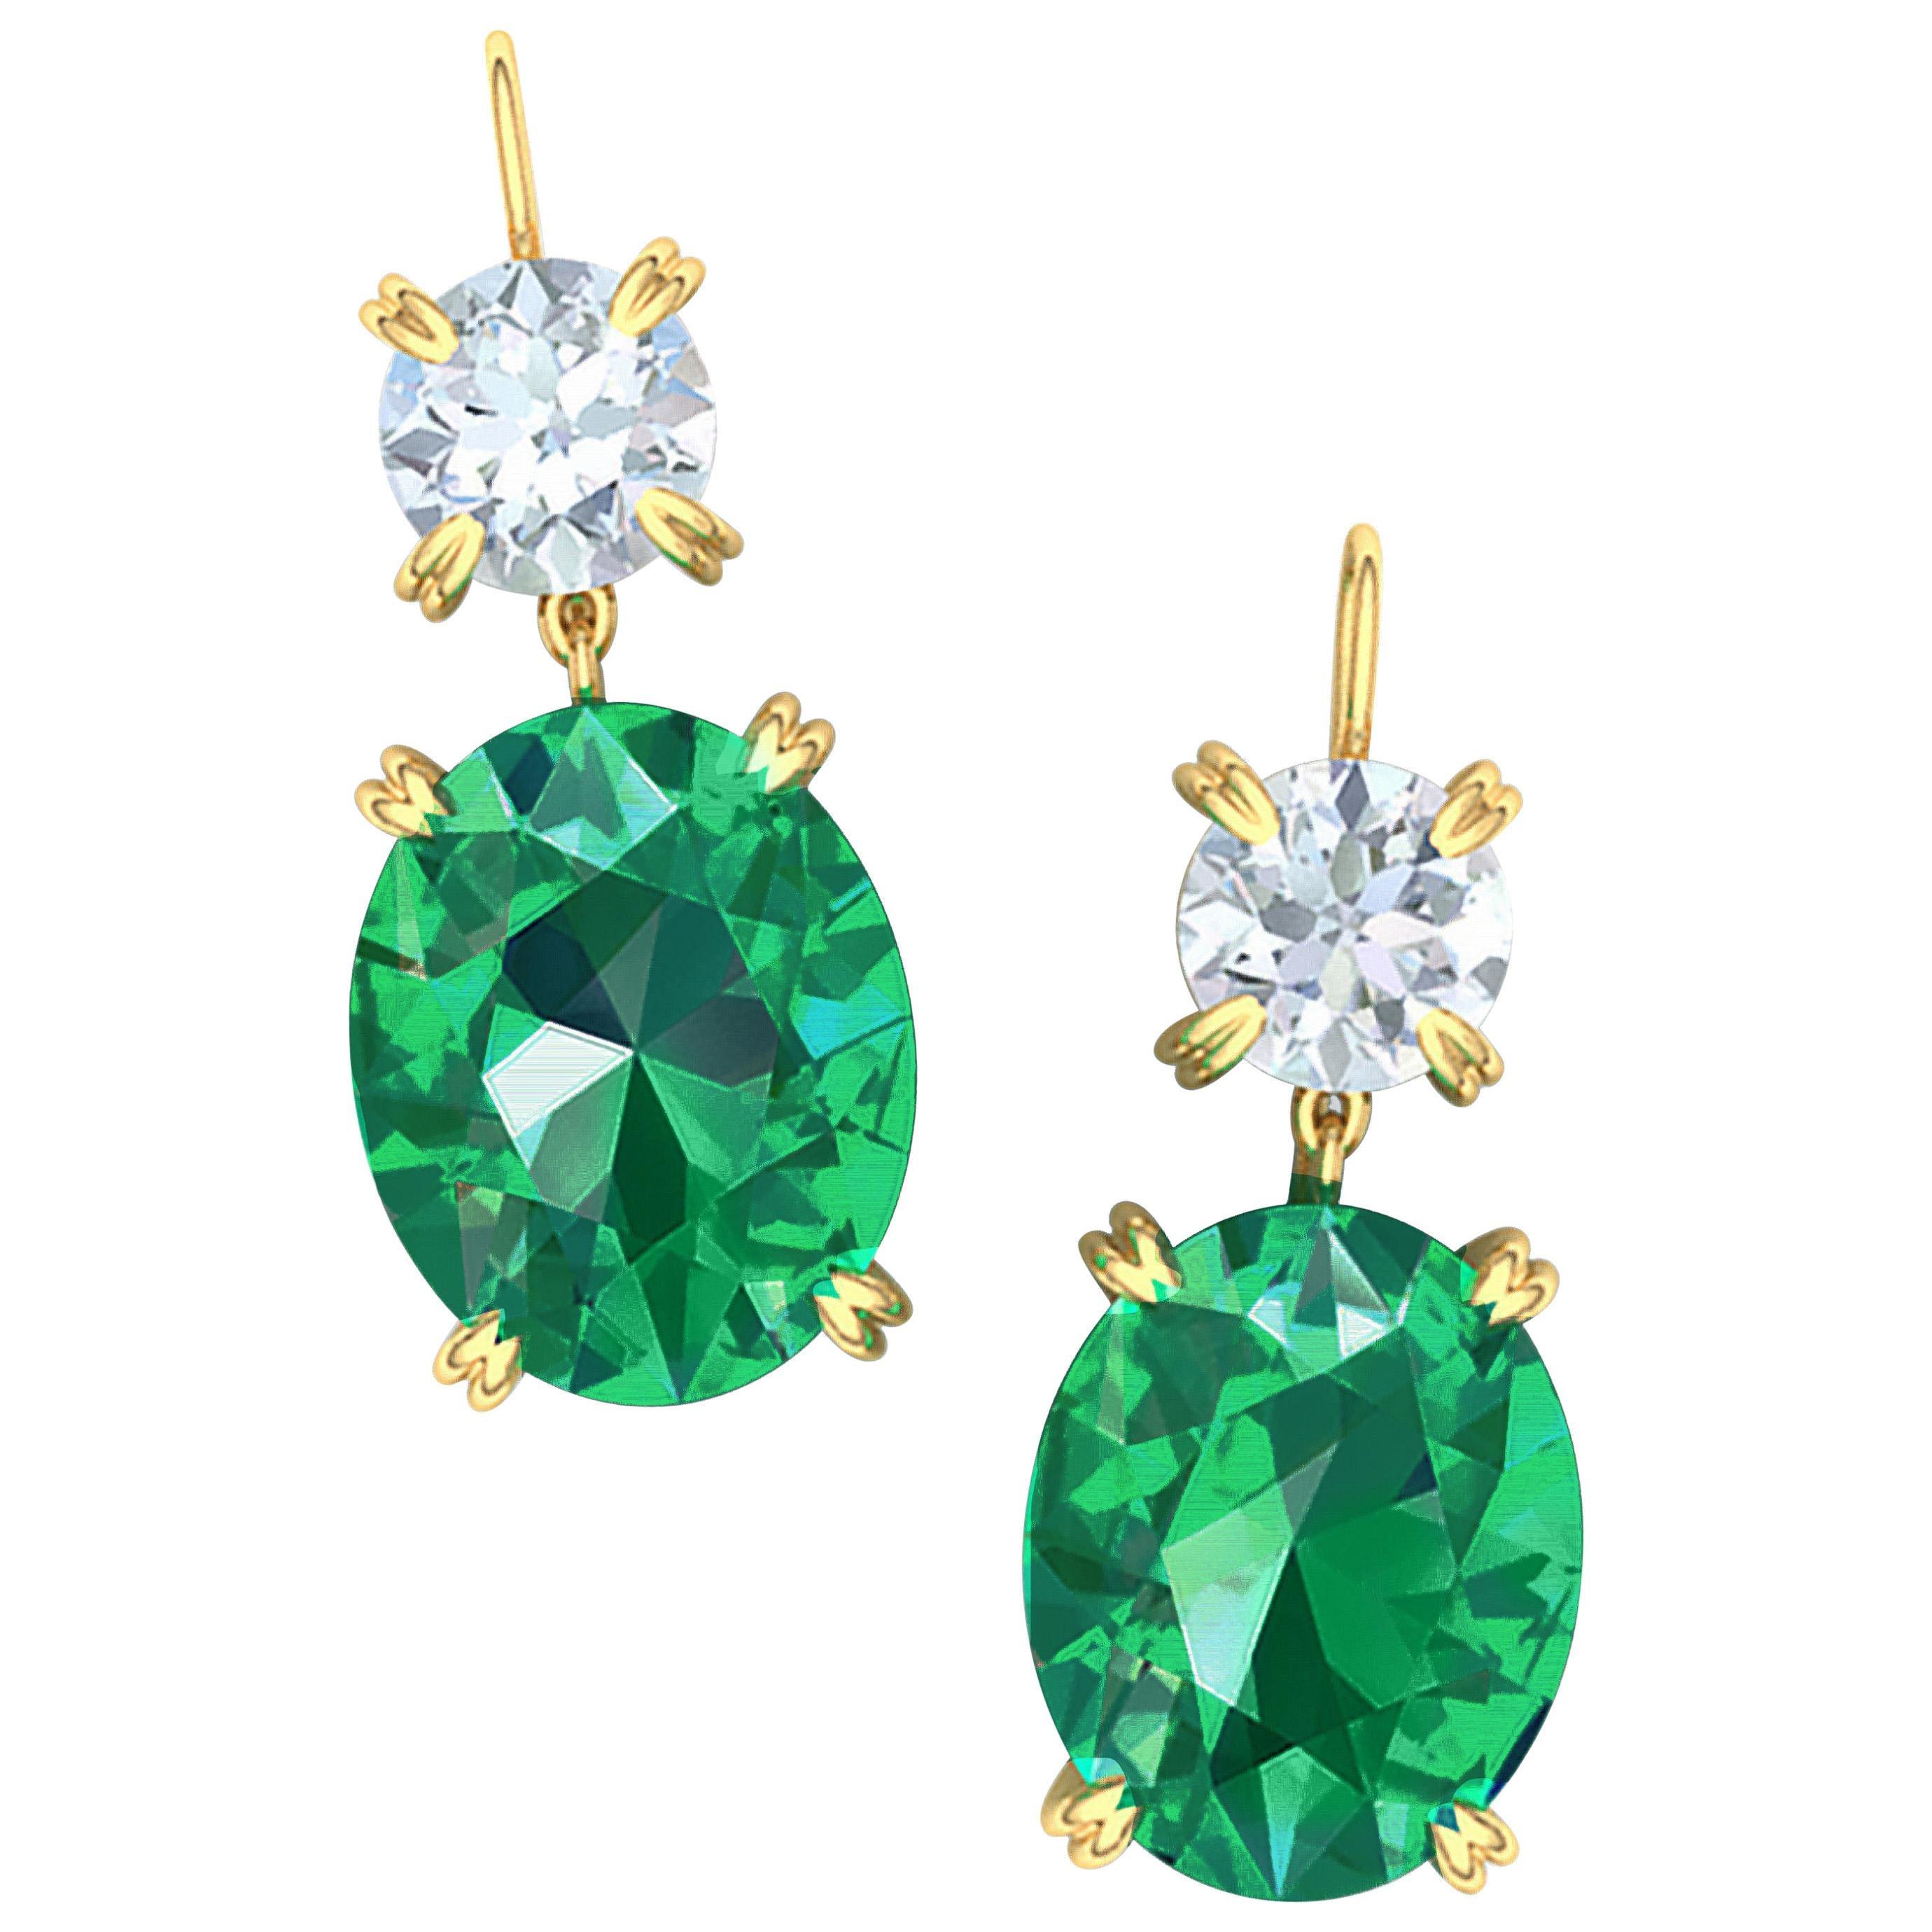 2.3 Carat Emerald and Diamond Drop Earrings